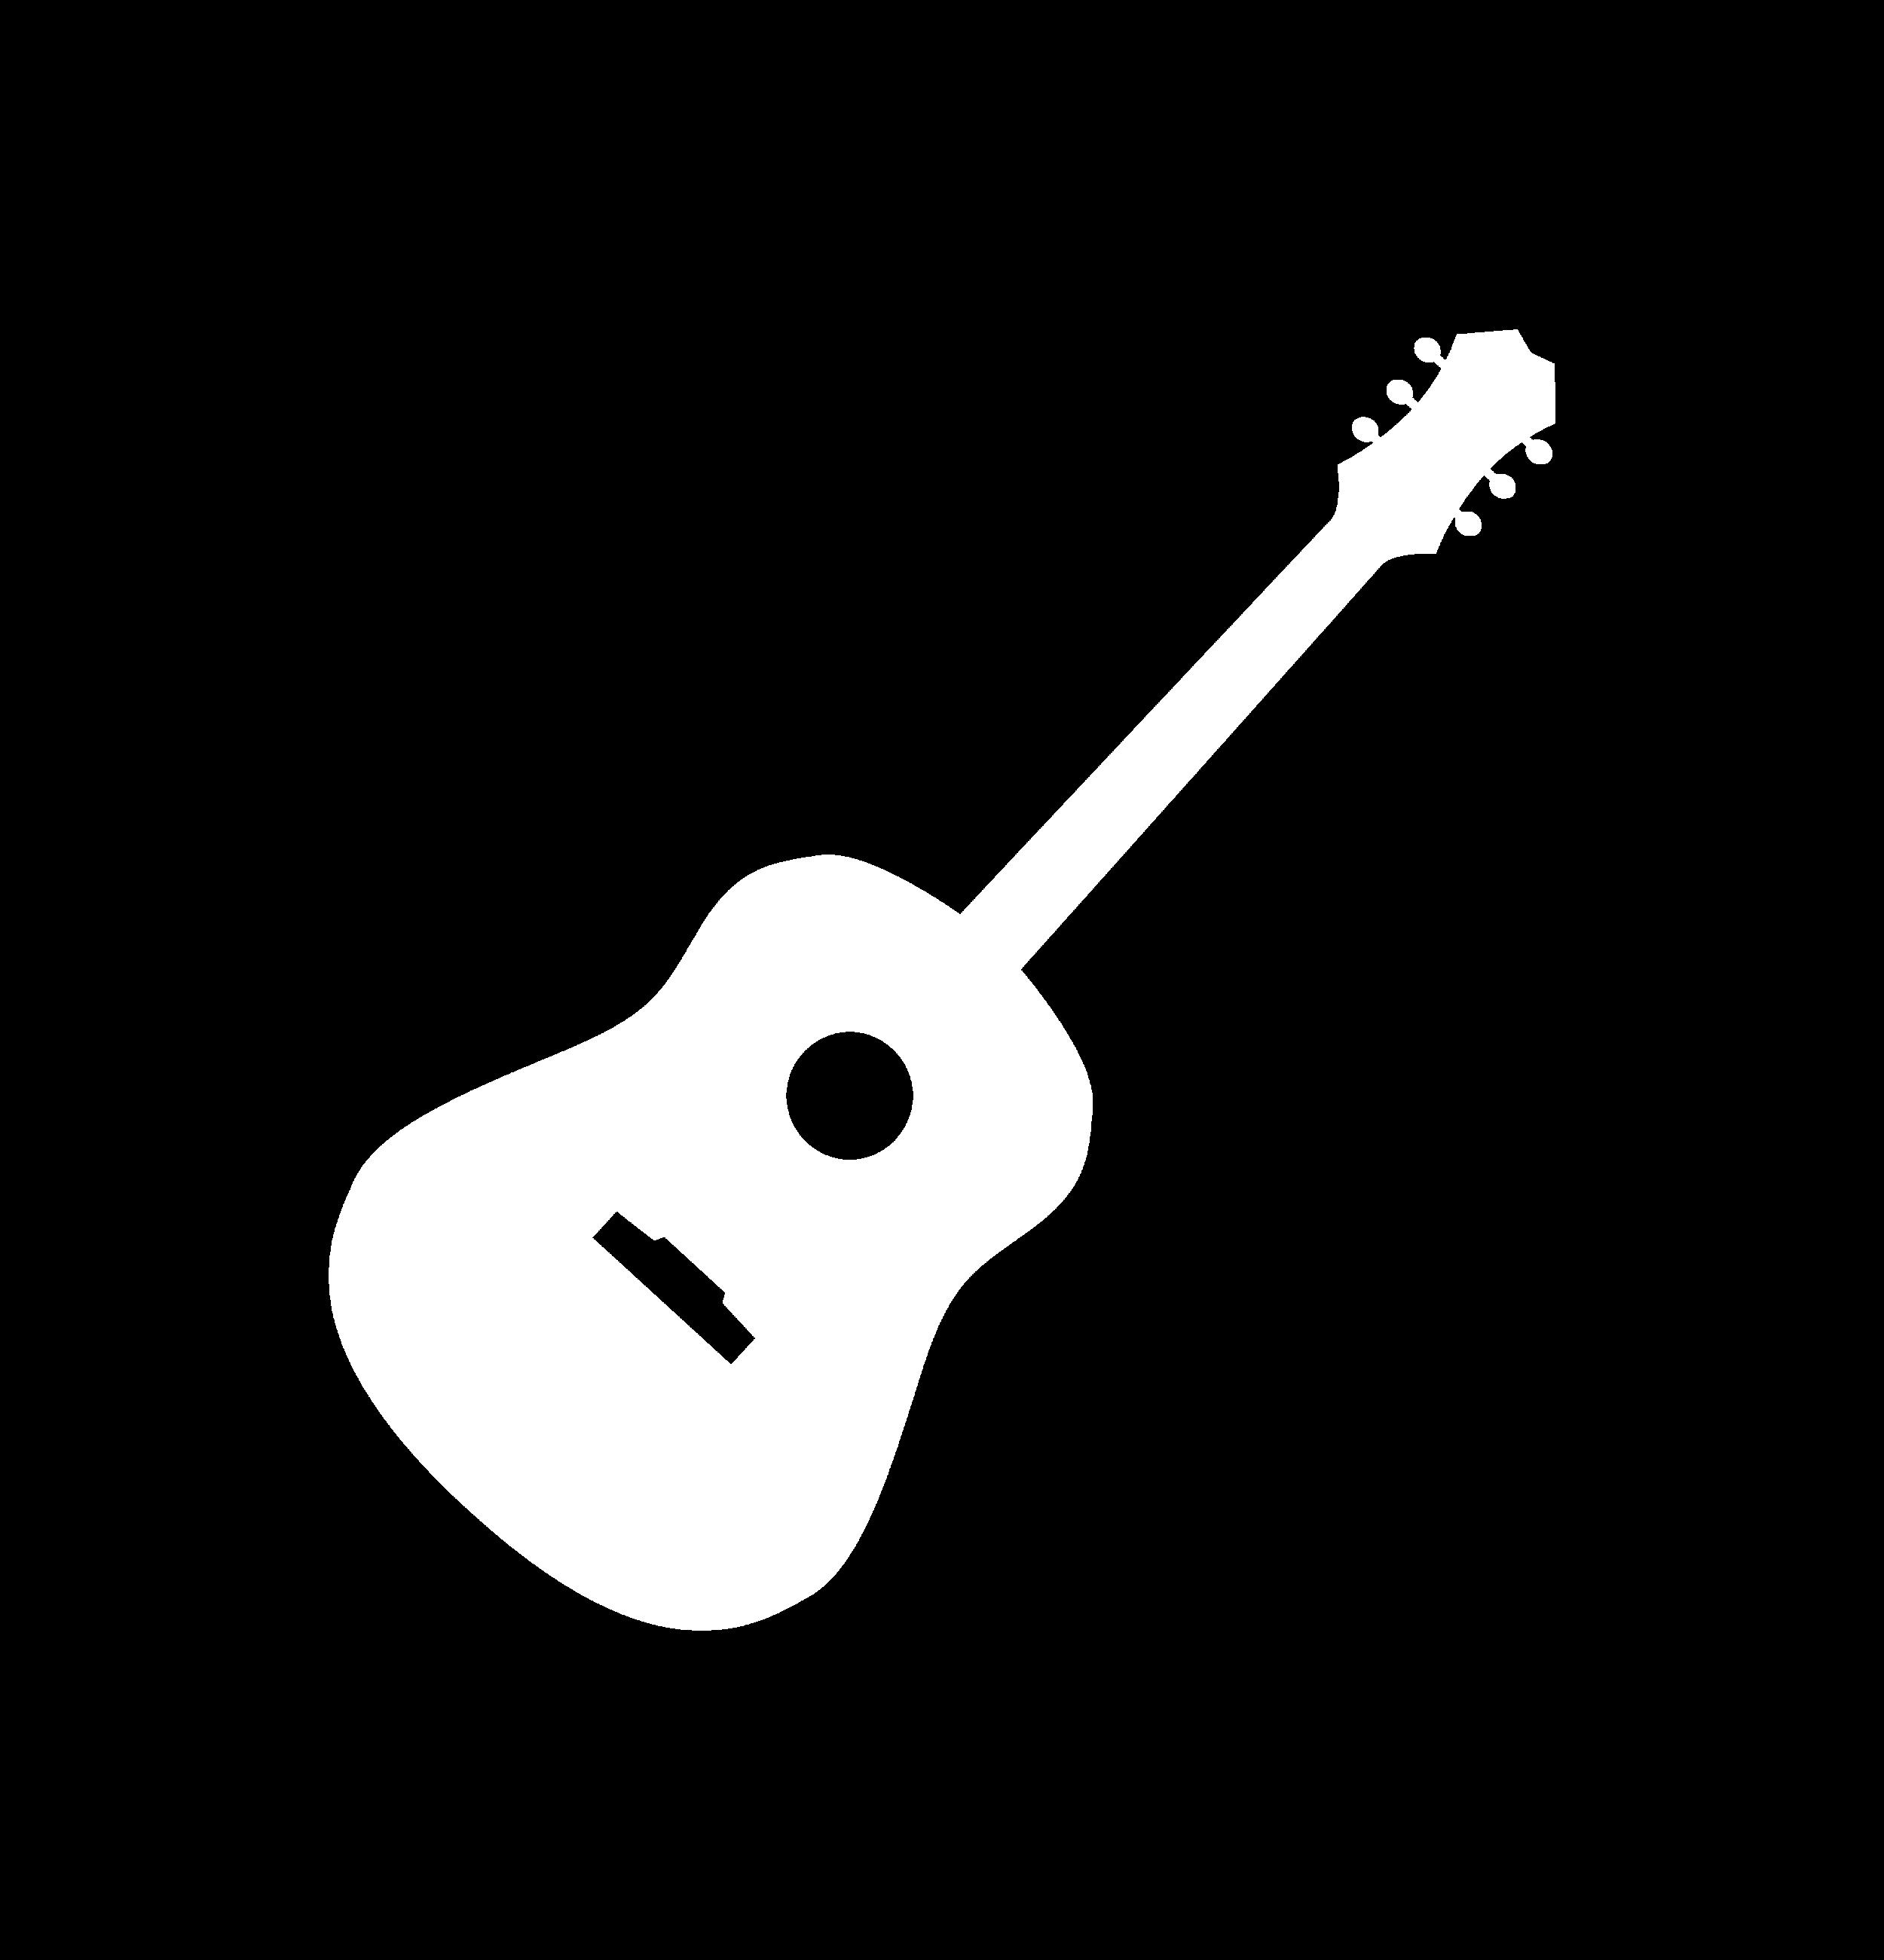 logo-white (9).png